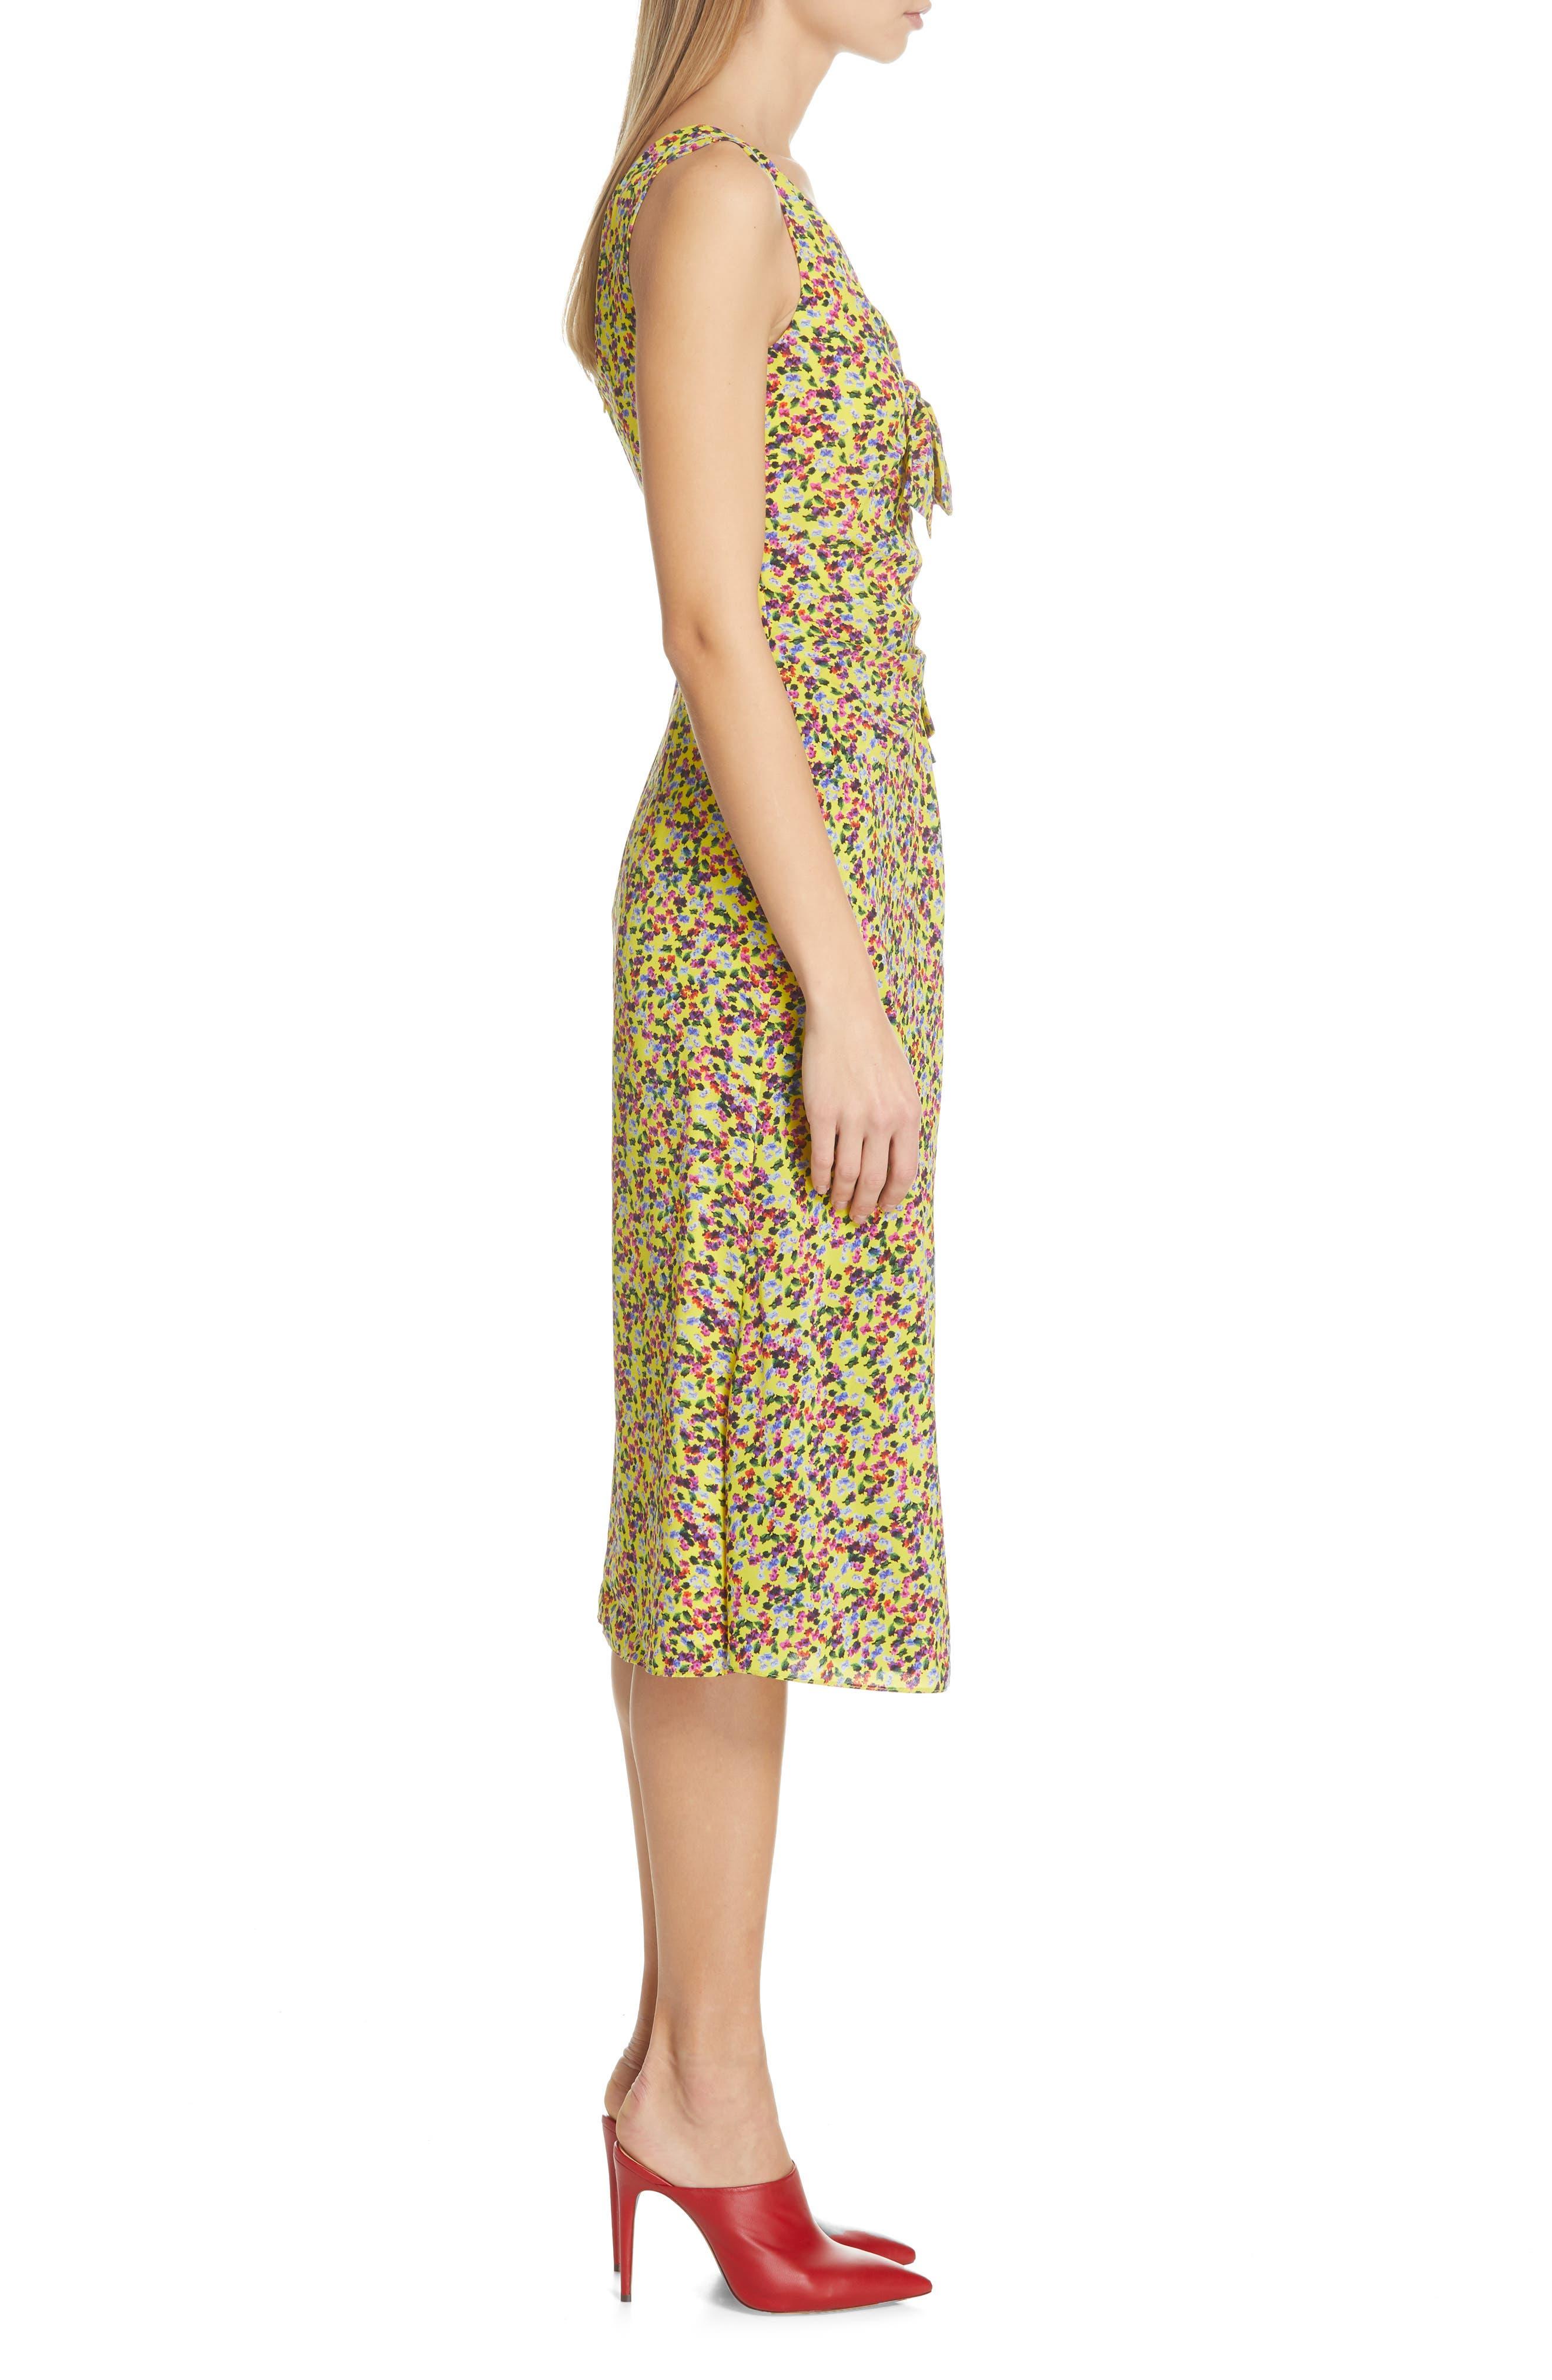 SALONI, Penelope Floral Print Silk Midi Dress, Alternate thumbnail 3, color, YELLOW GARDENIA